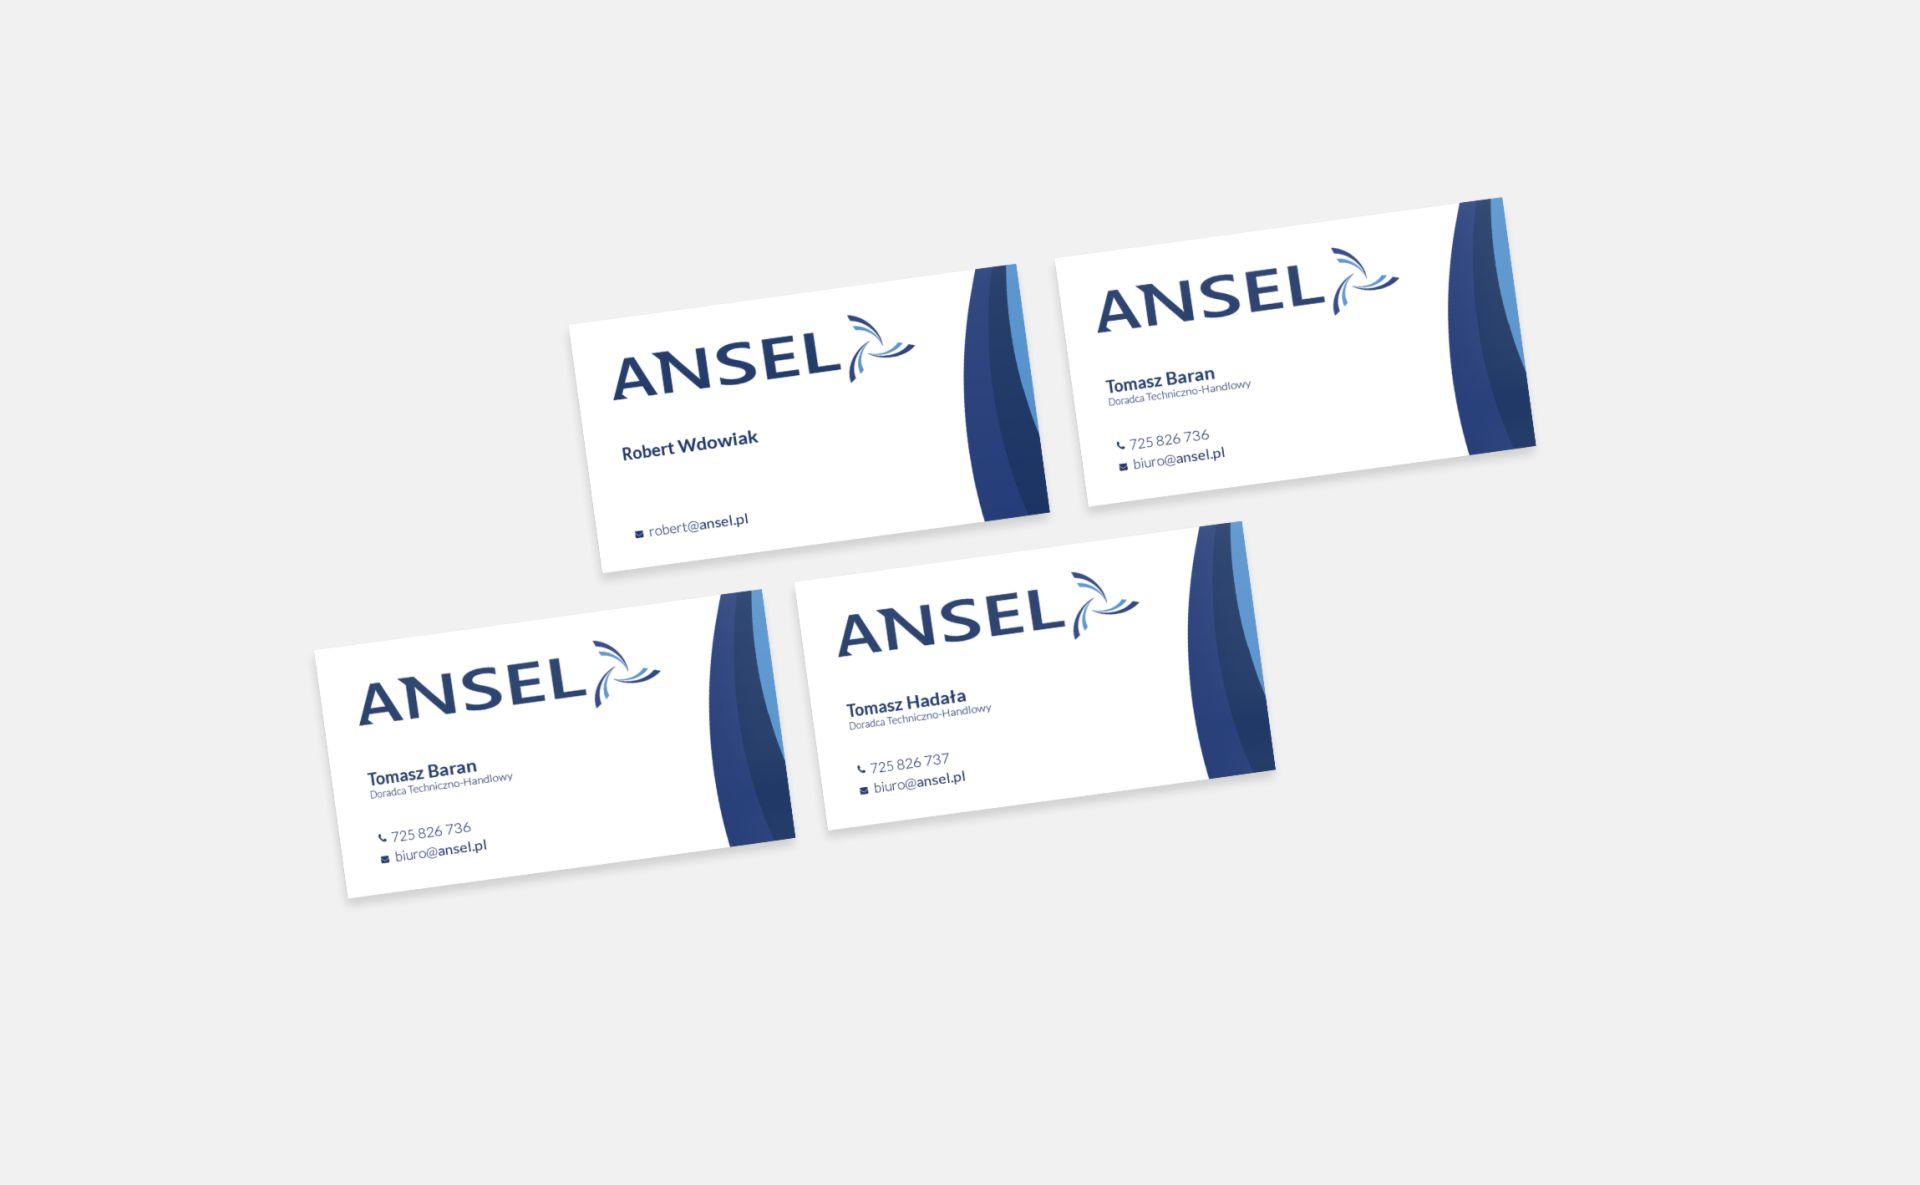 Ansel - Realizacja - Agencja ROXART